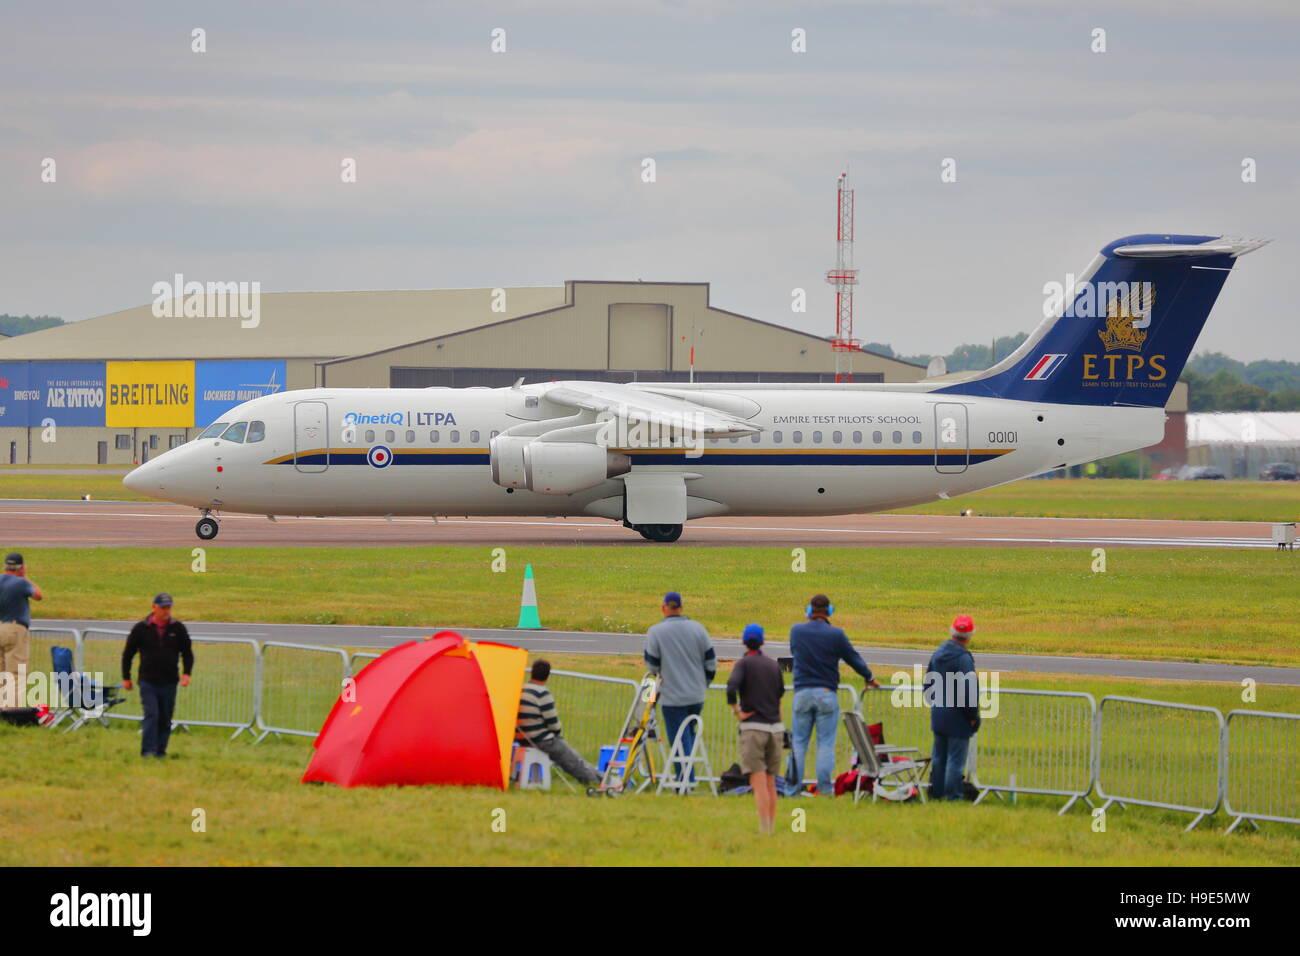 ETPS Avro RJ at RIAT Fairford 2014 Air Show - Stock Image